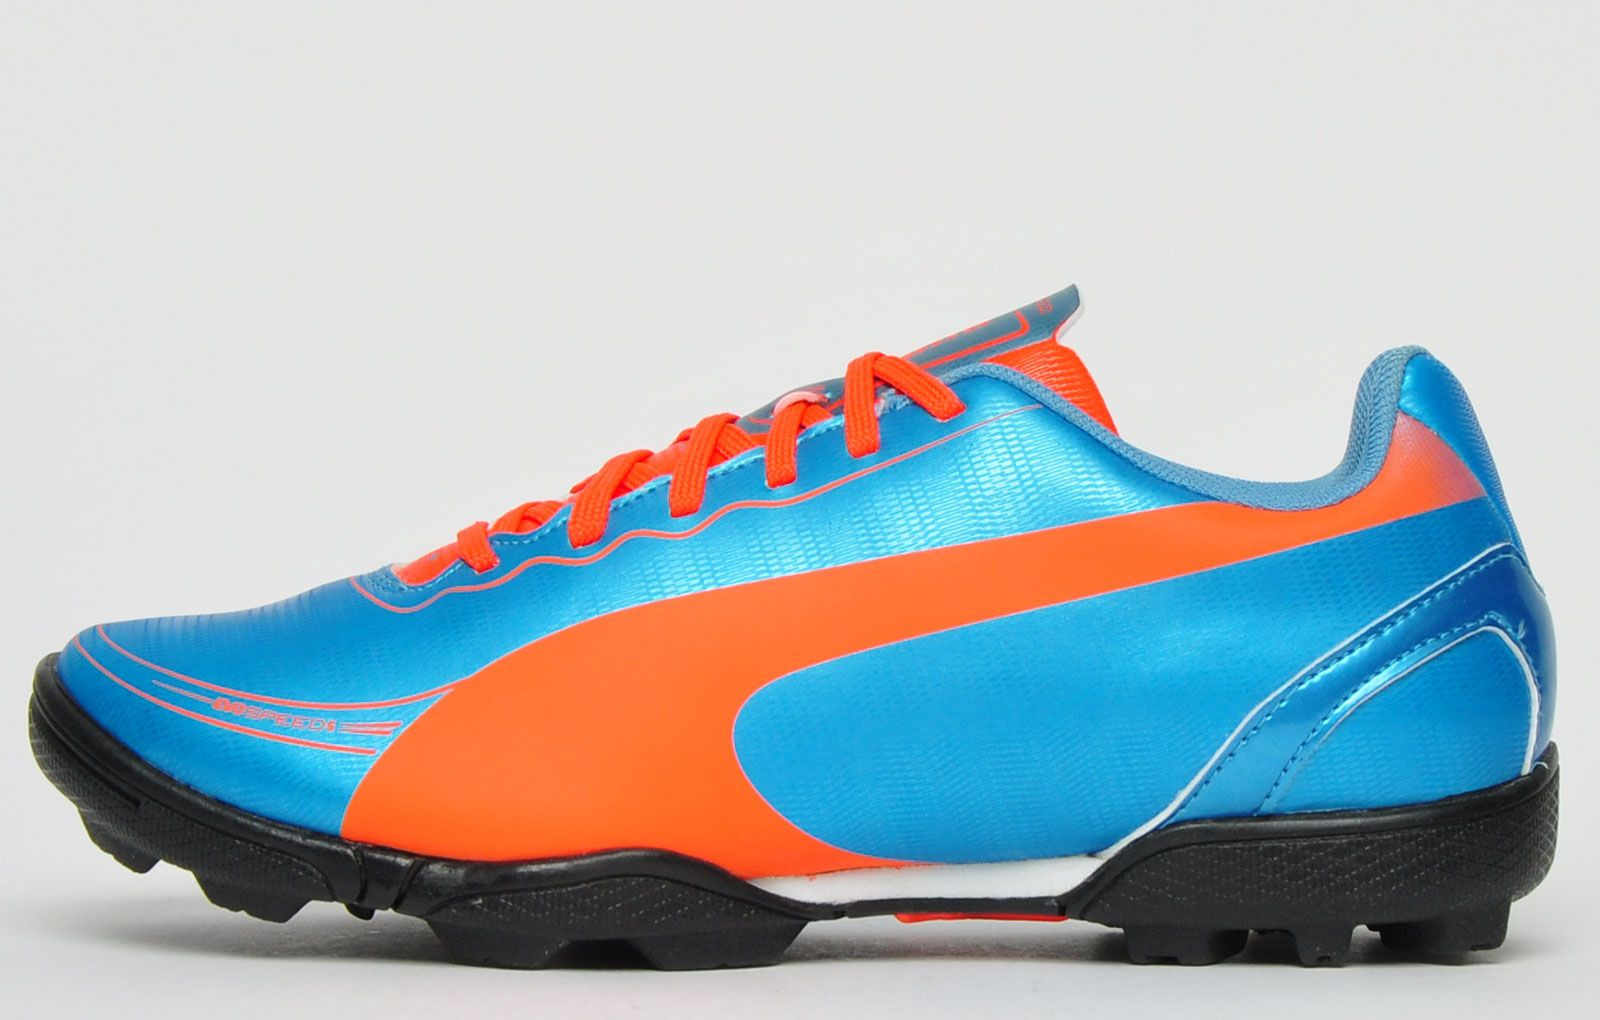 Puma Evo Speed 5.2 TT Junior Football Boots